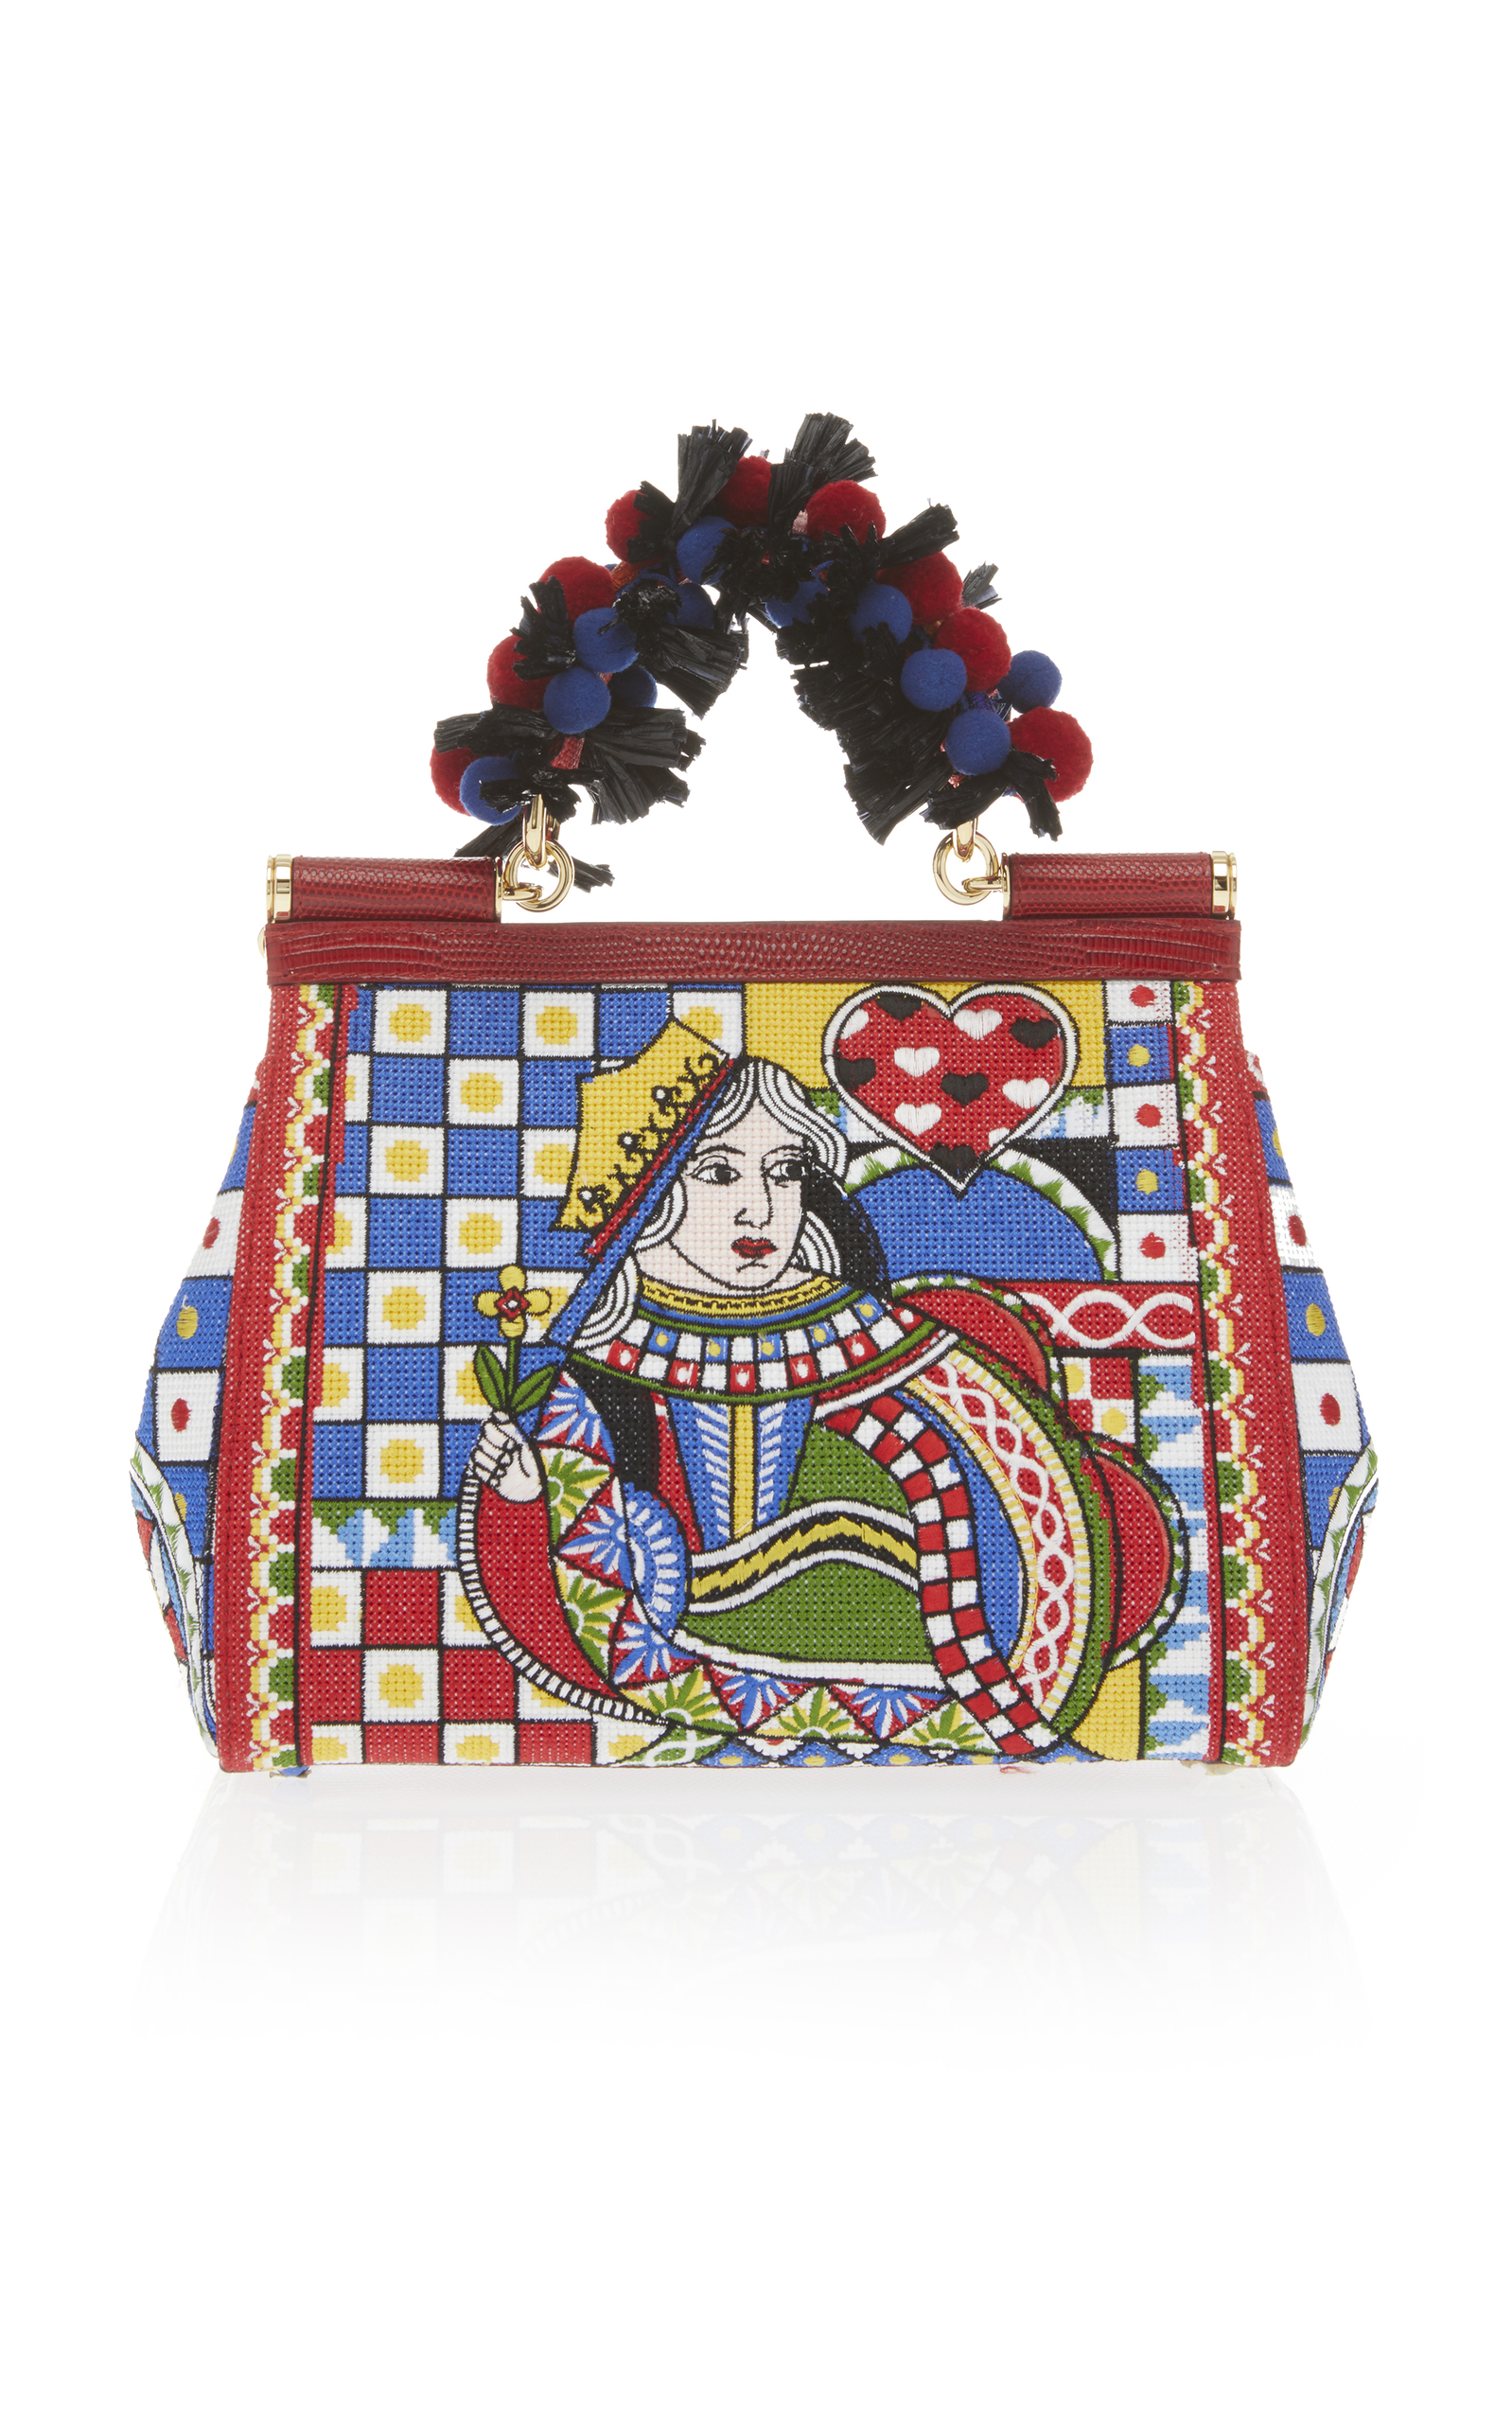 fea3c712d3 Dolce   GabbanaMedium Sicily Bag. CLOSE. Loading. Loading. Loading. Loading